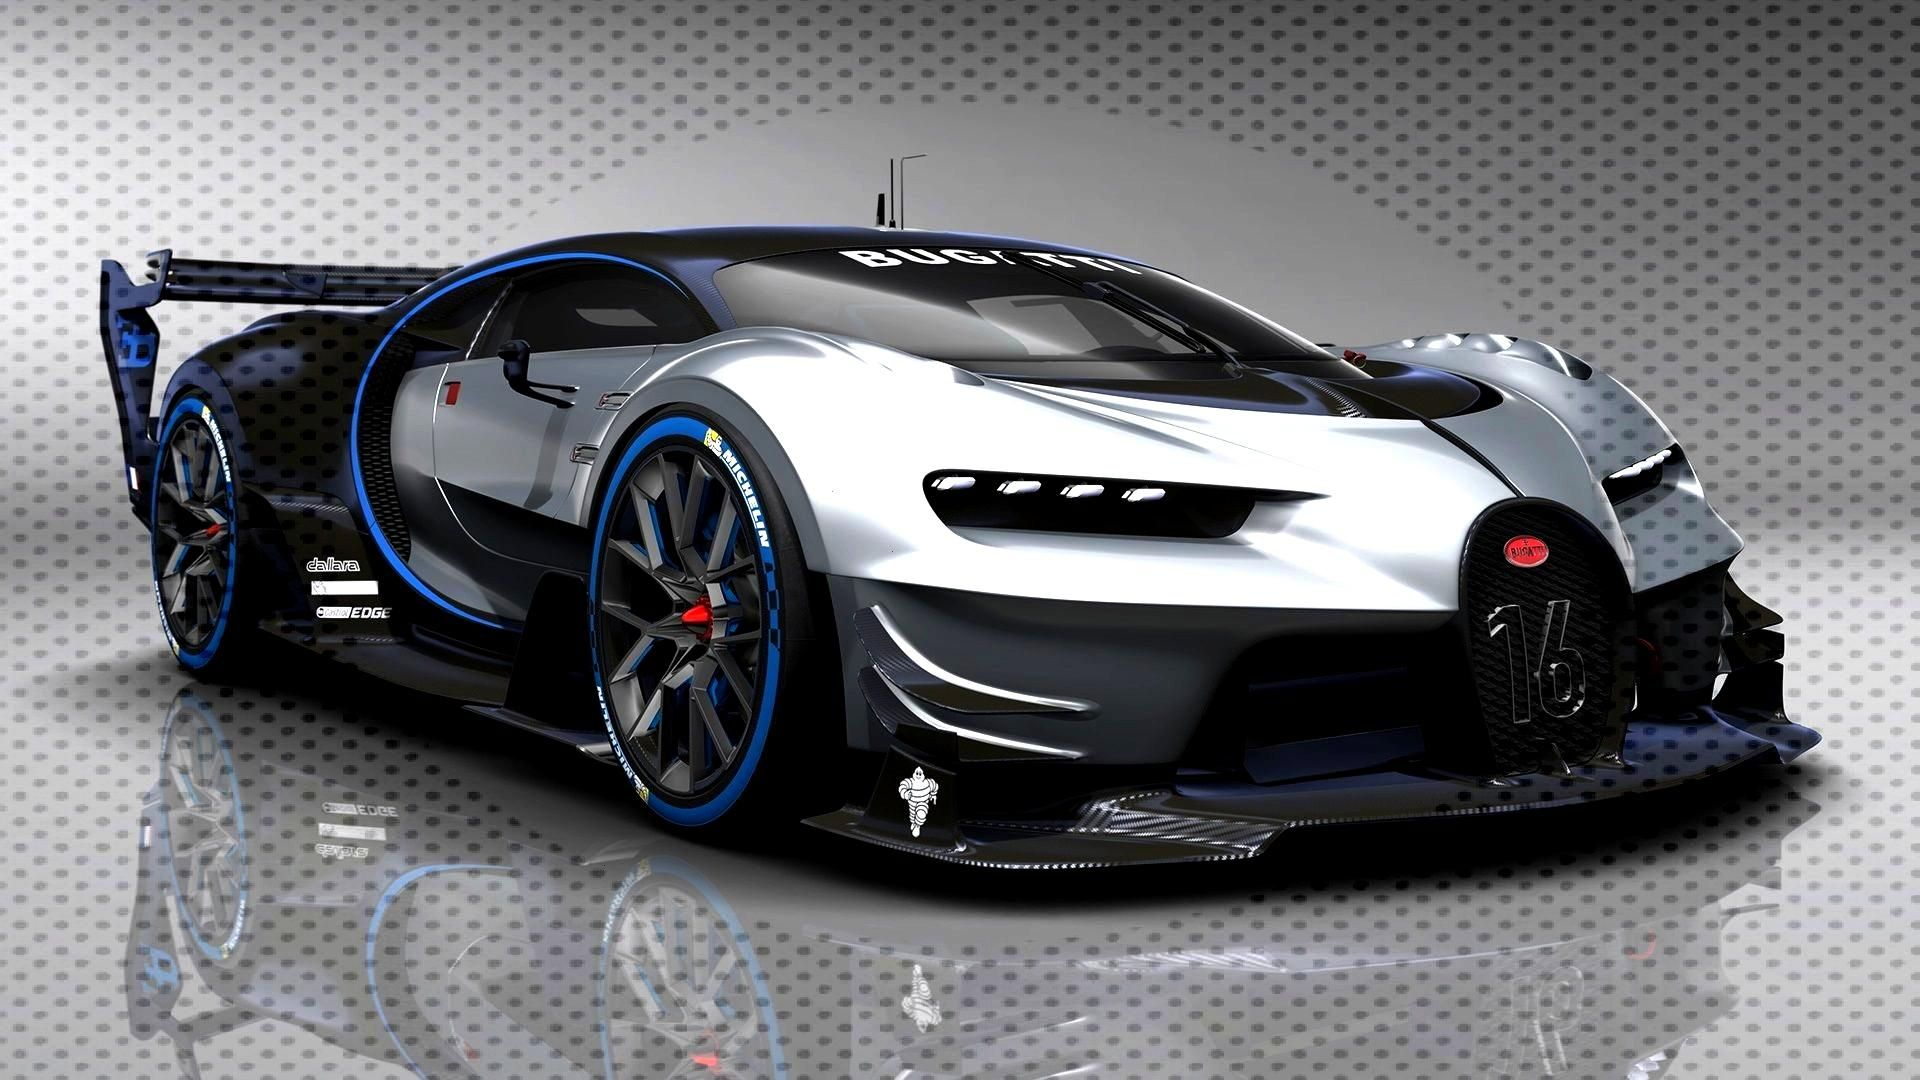 Bugatti Vision Autos Gt Bugatti Vision Gt Autos Bugatti Vision Gt Autos Bugatti Vision Gt Autos Sports Car Bugatti Car